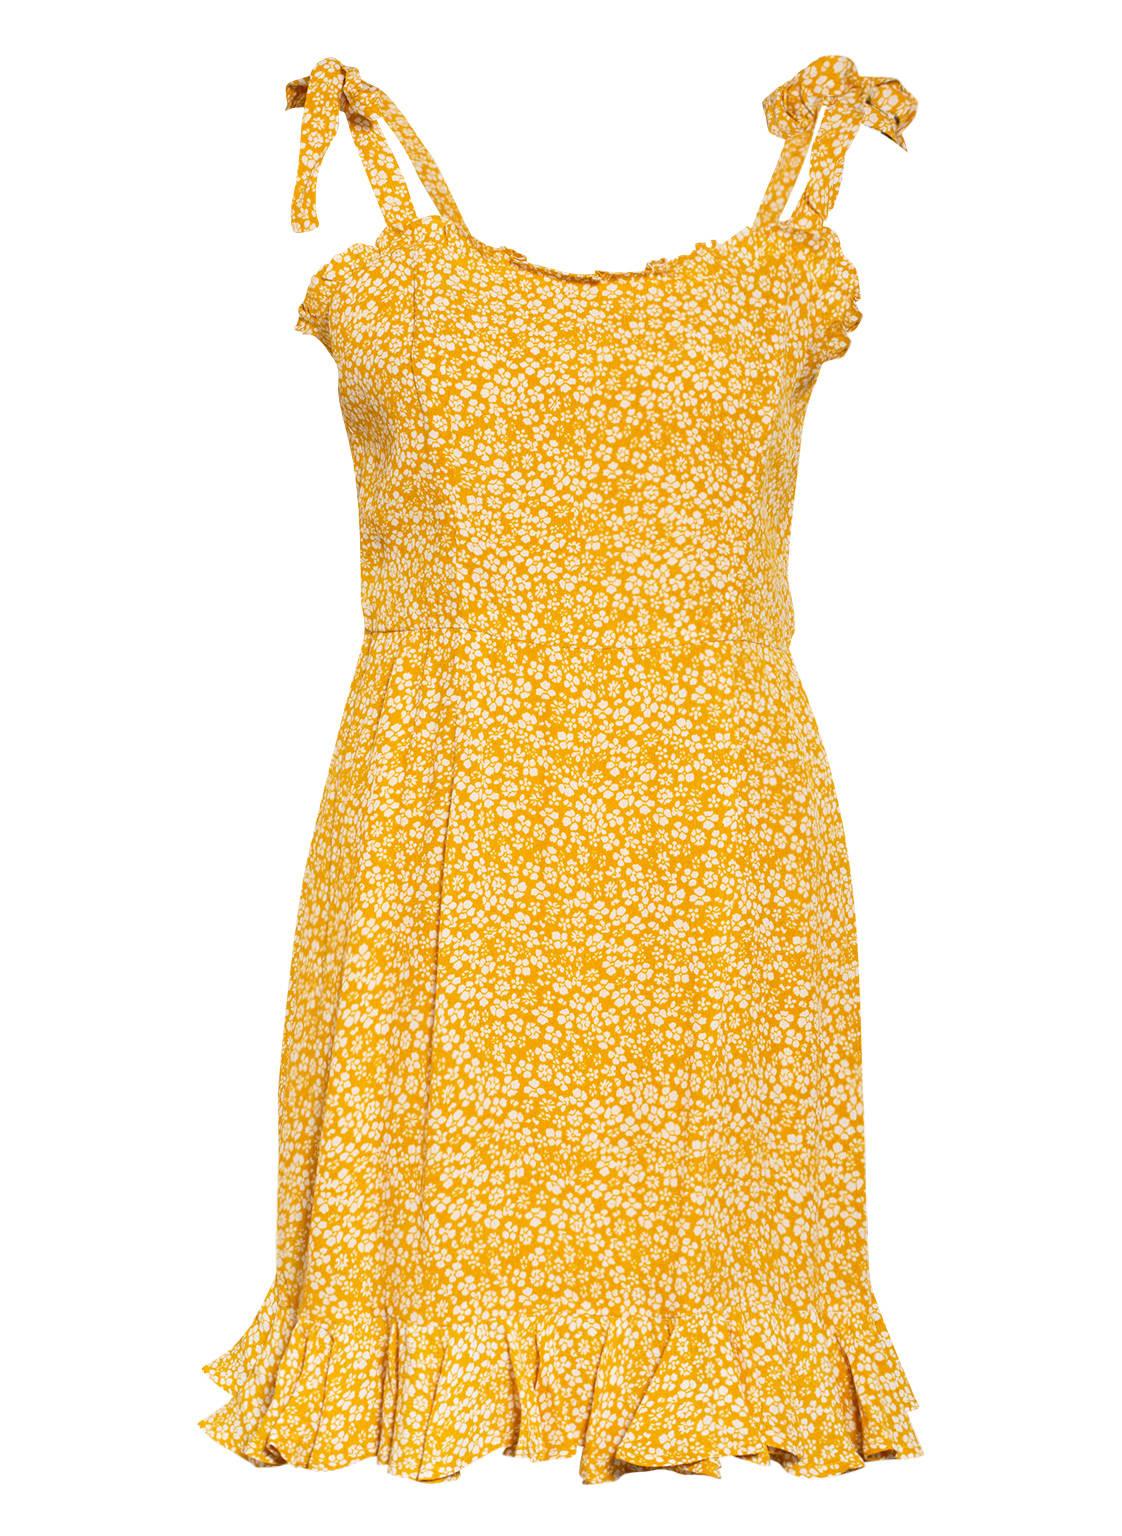 Image of Bardot Kleid Ditsy gelb